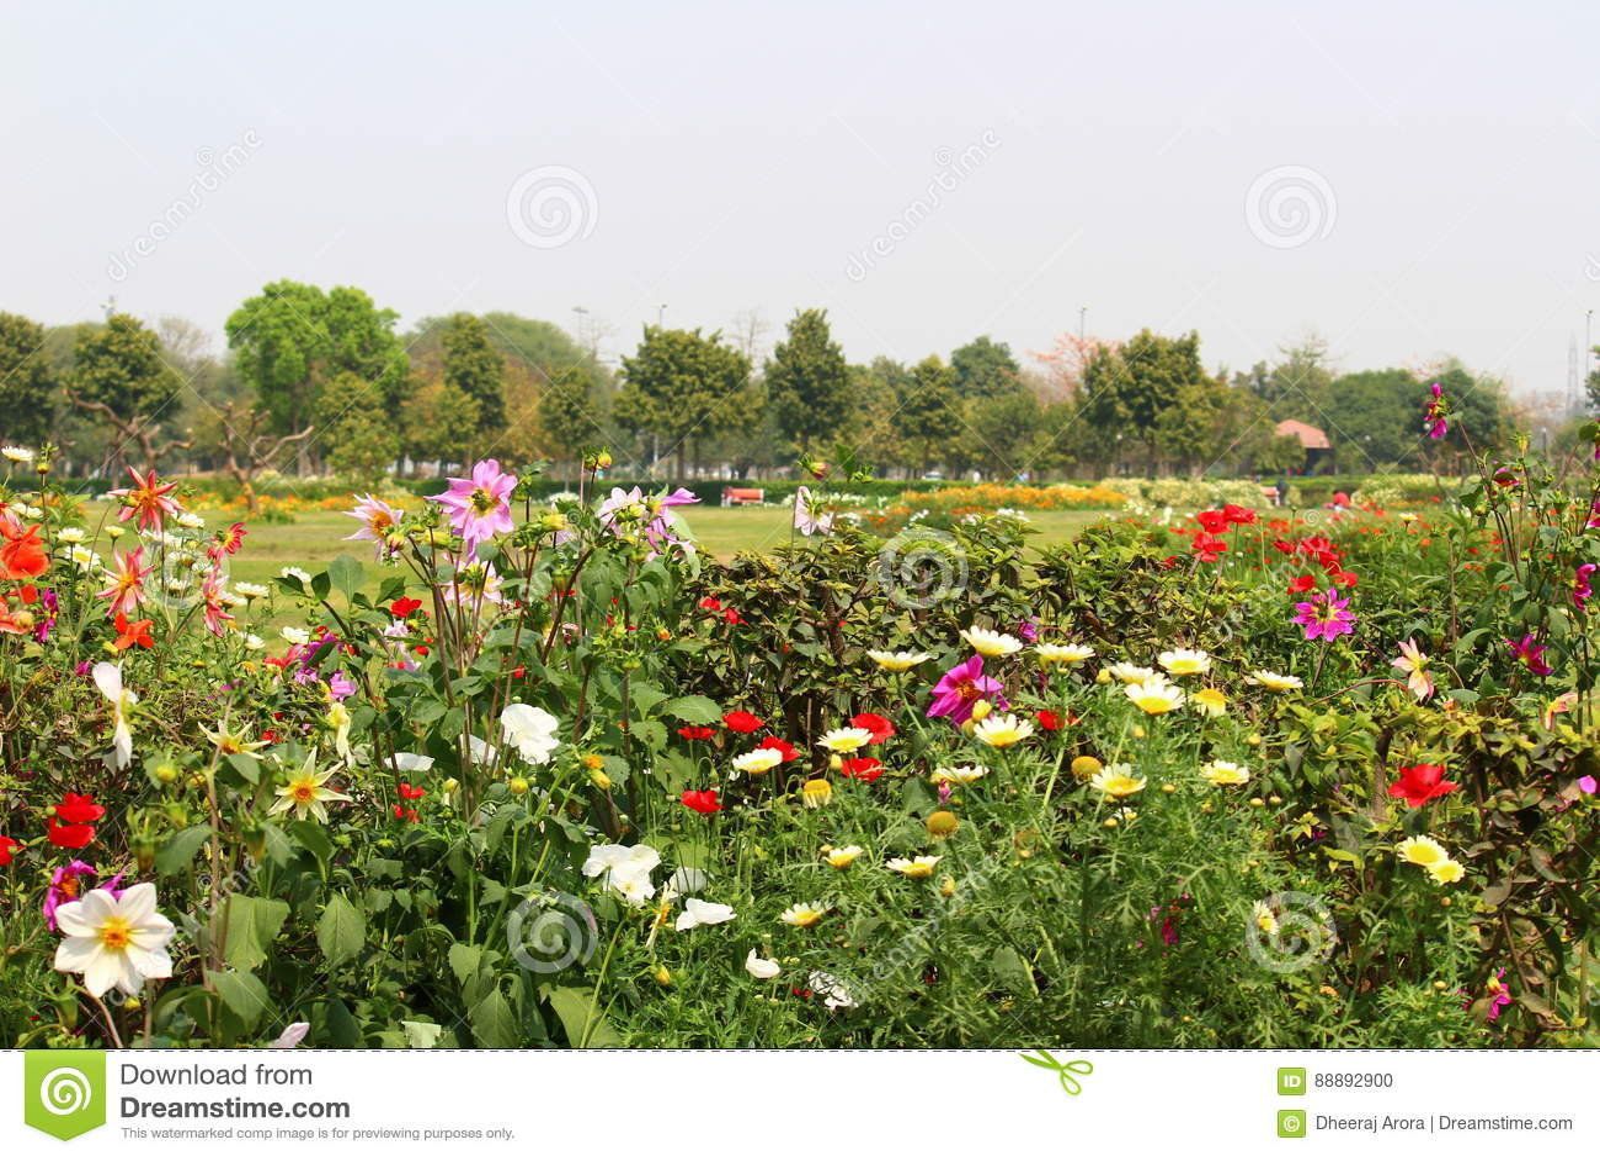 Swarn Jayanti Park Rohini New Delhi India Stock Photo Image Of